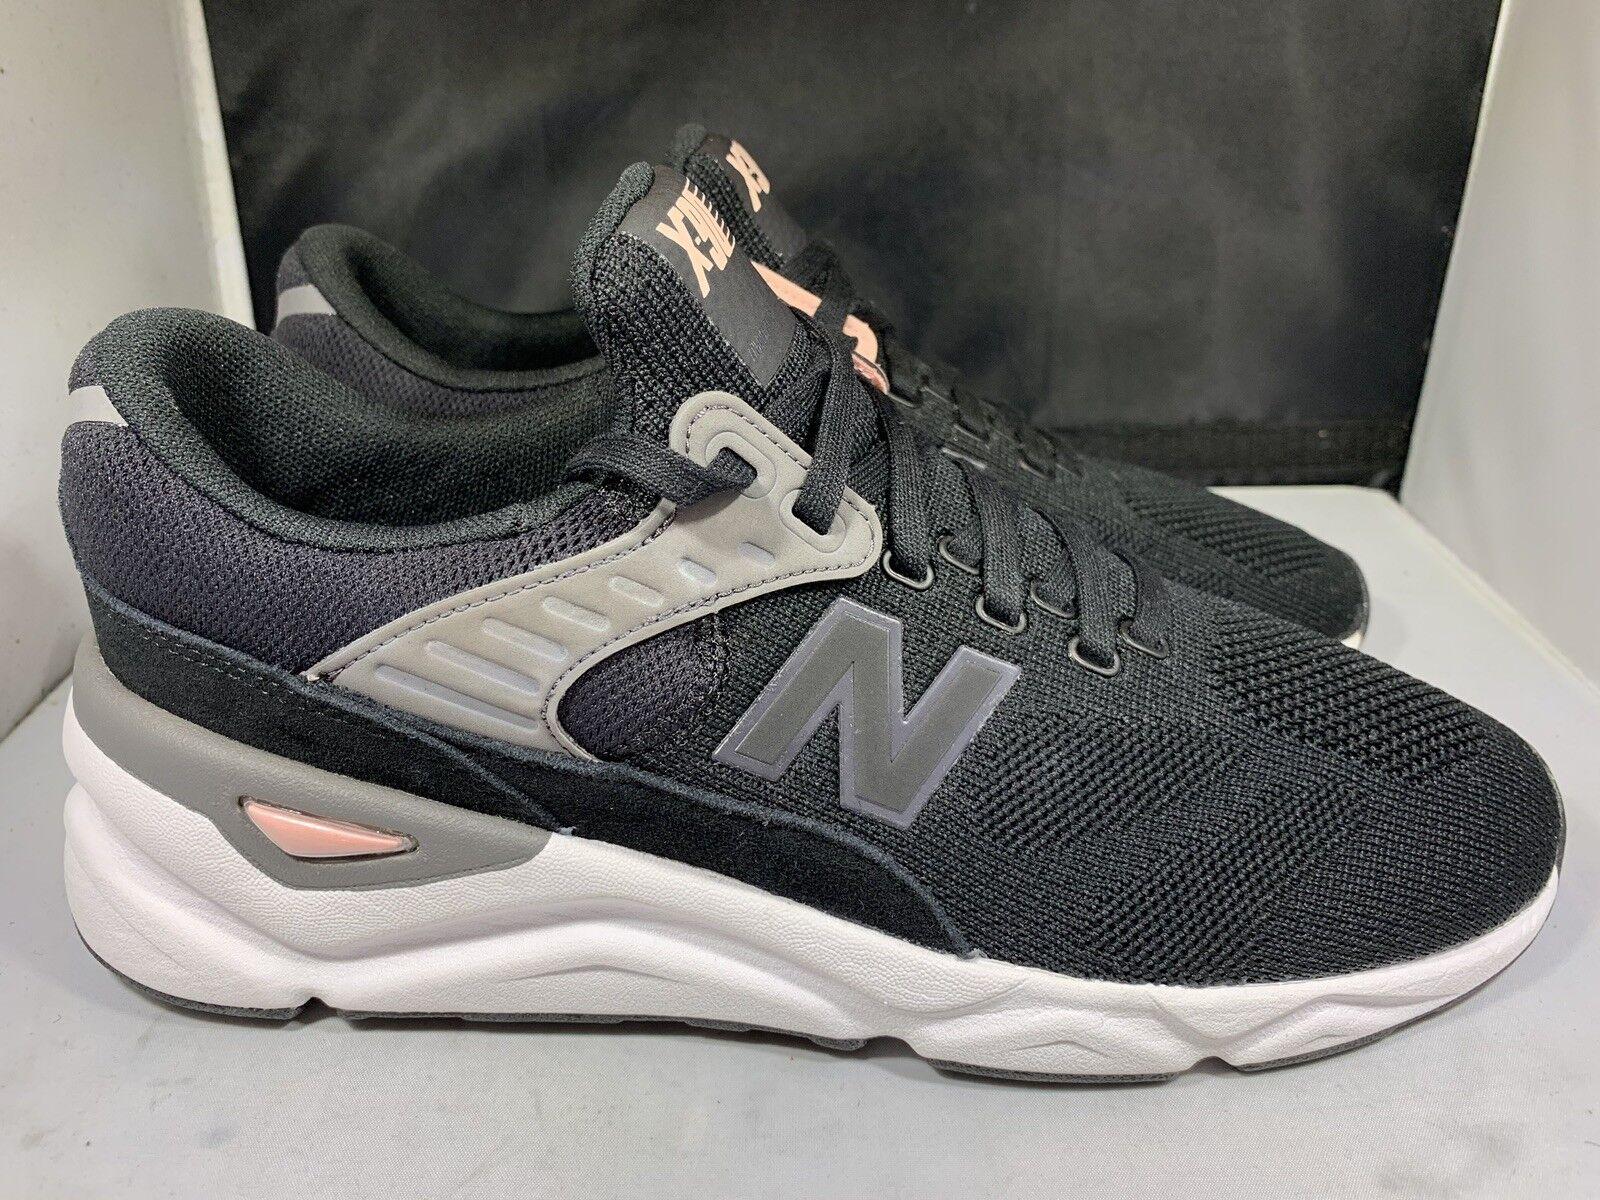 buy popular 1c8e2 5351a ... New Balance Men s MSX90HTC black white pink tennis shoes size size size  9.5d (NB8 ...